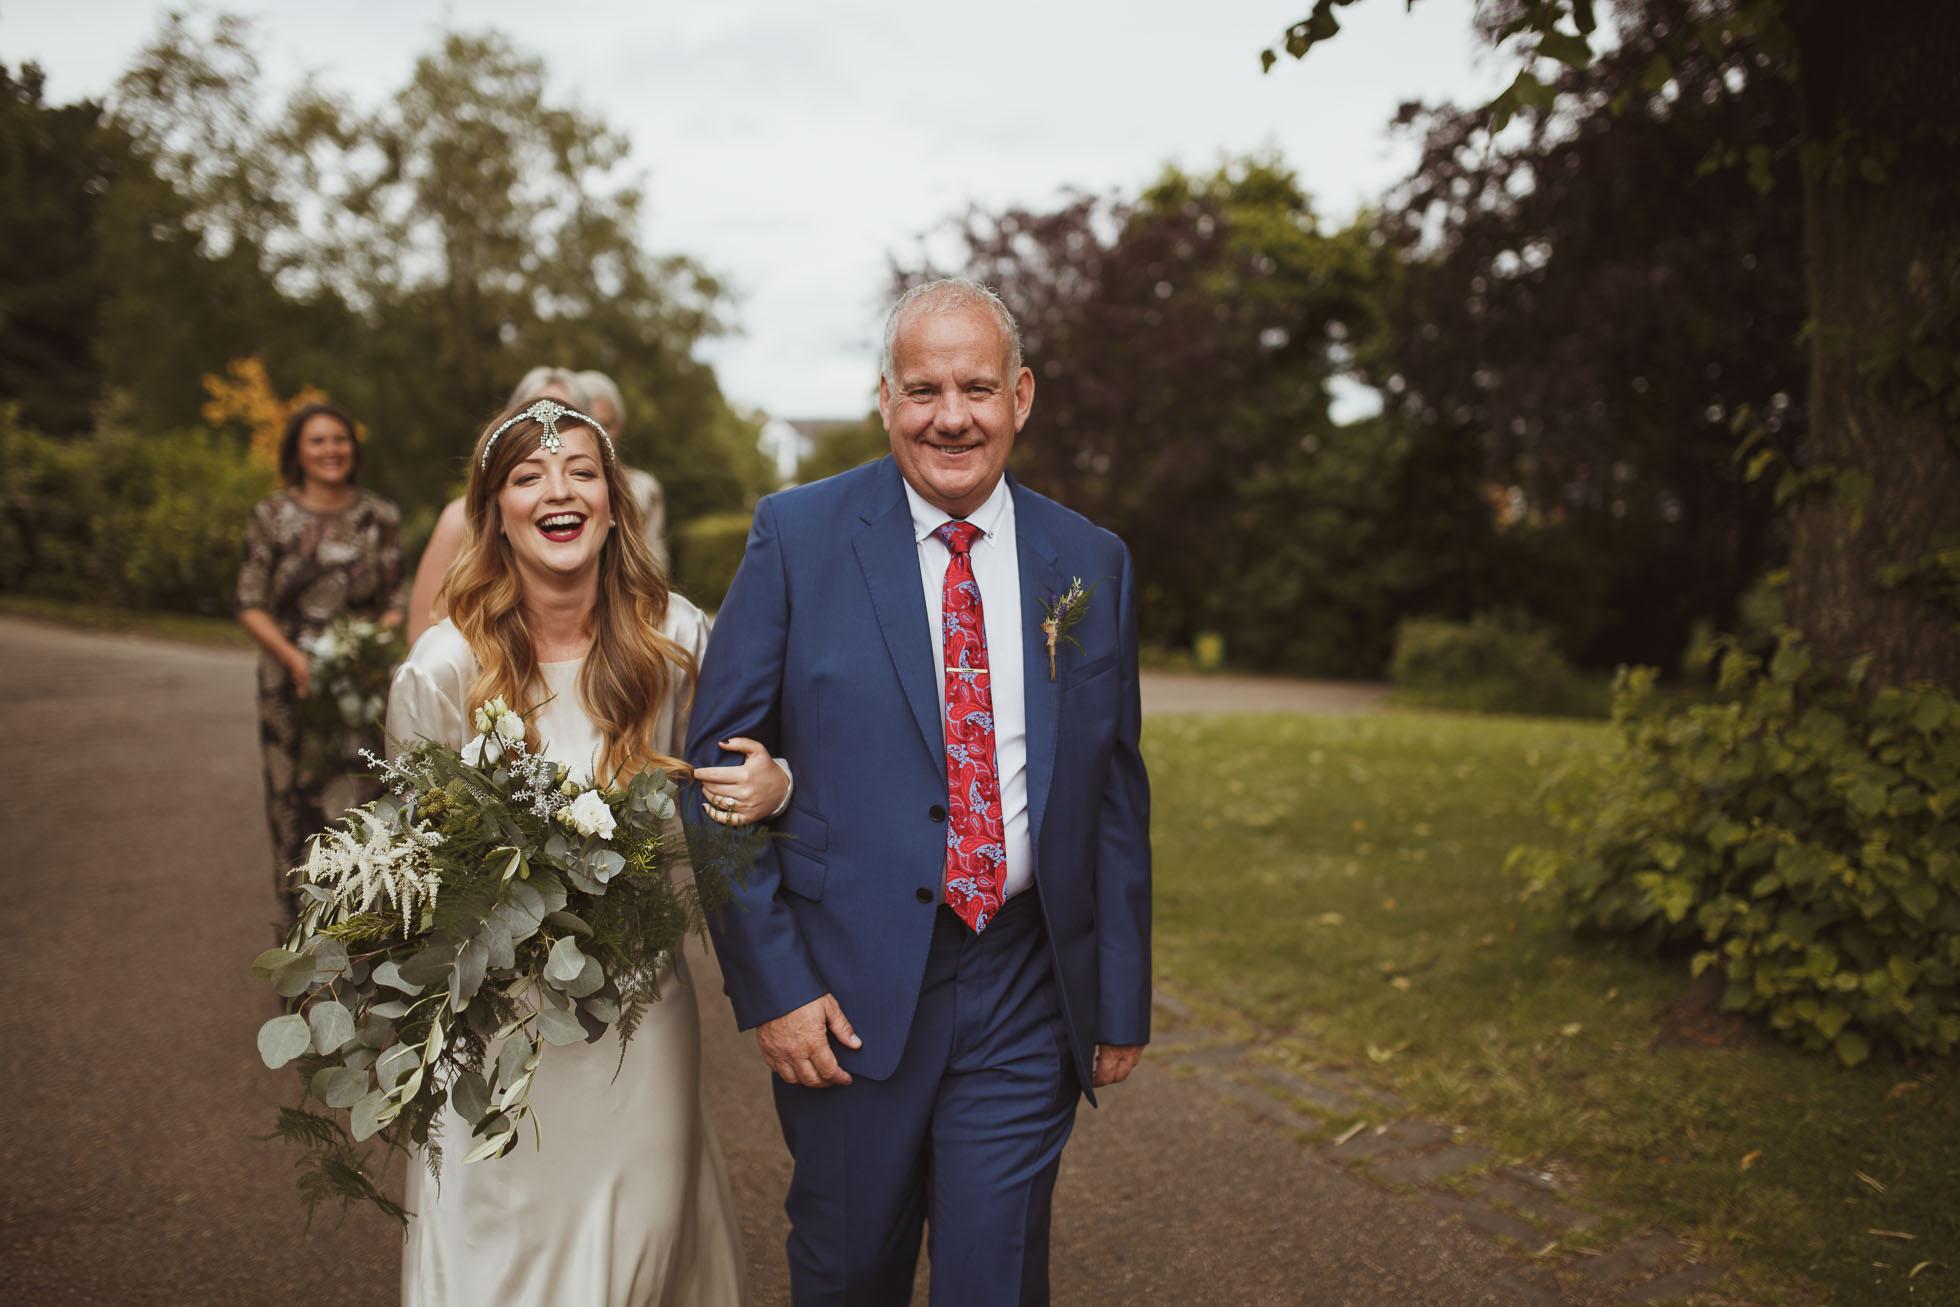 sheffield-botanical-gardens-wedding-photographer-20.jpg